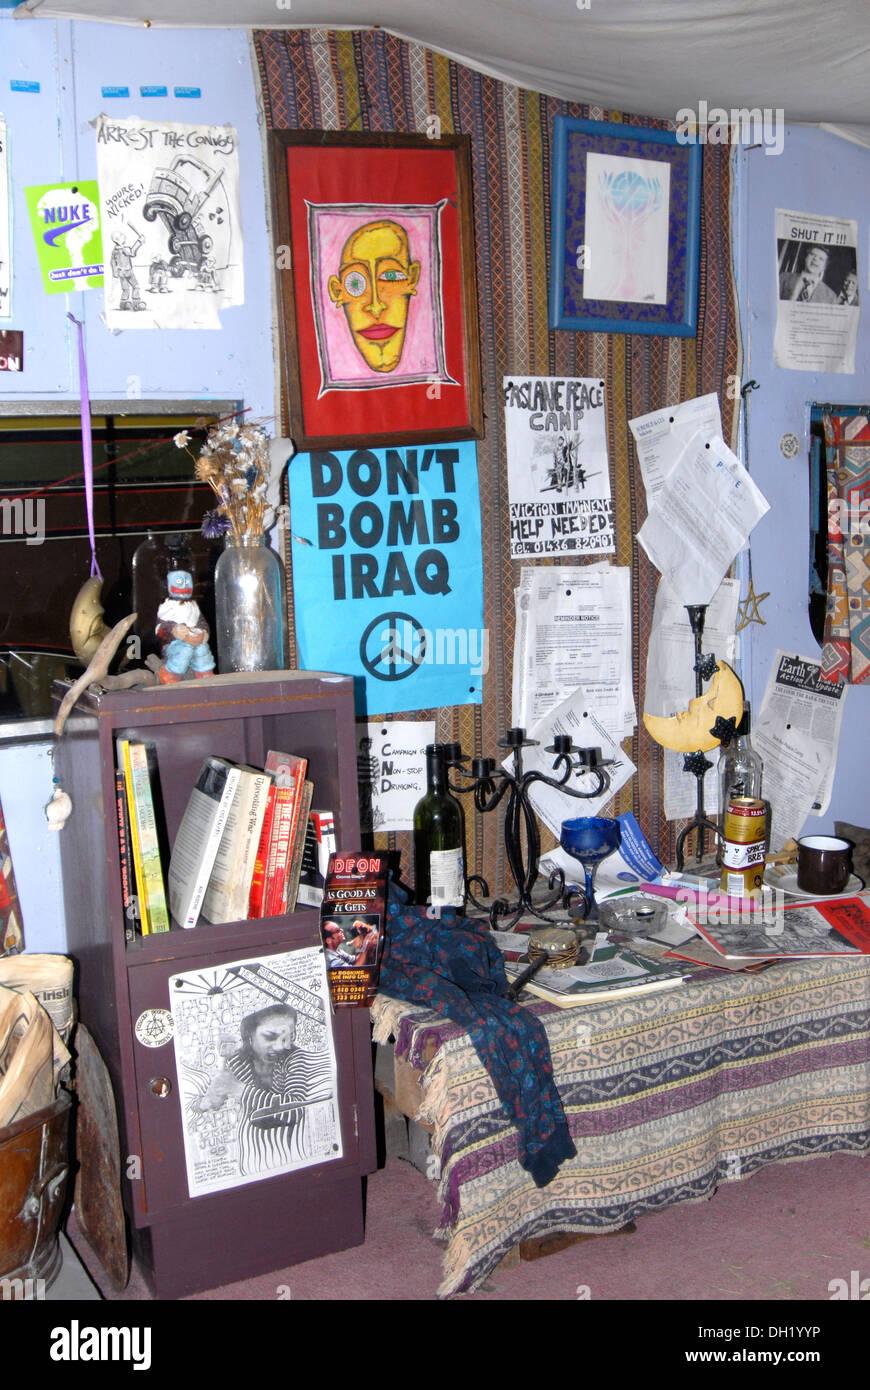 Interior of Faslane Peace Camp protester's caravan Stock Photo